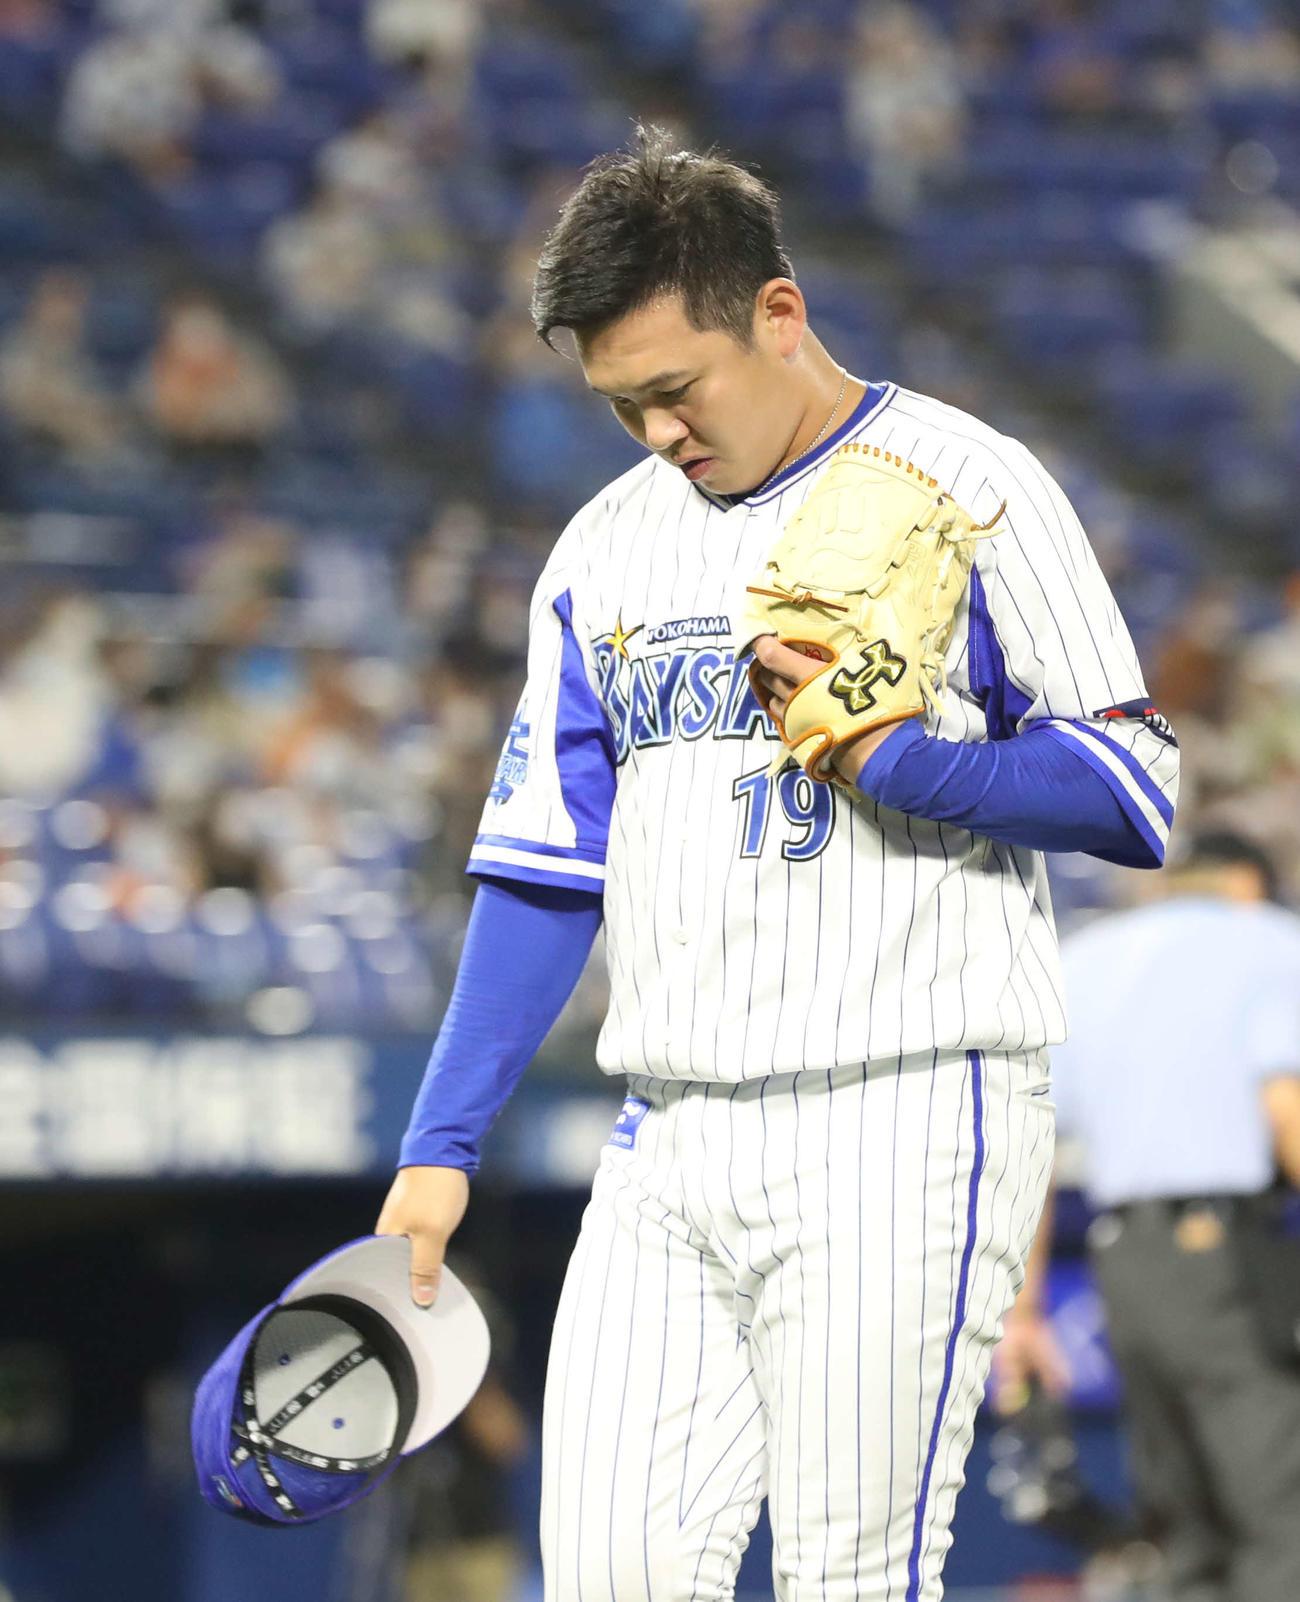 DeNA対巨人 9回表巨人2死一塁、同点となり降板する山崎(2020年7月19日撮影)